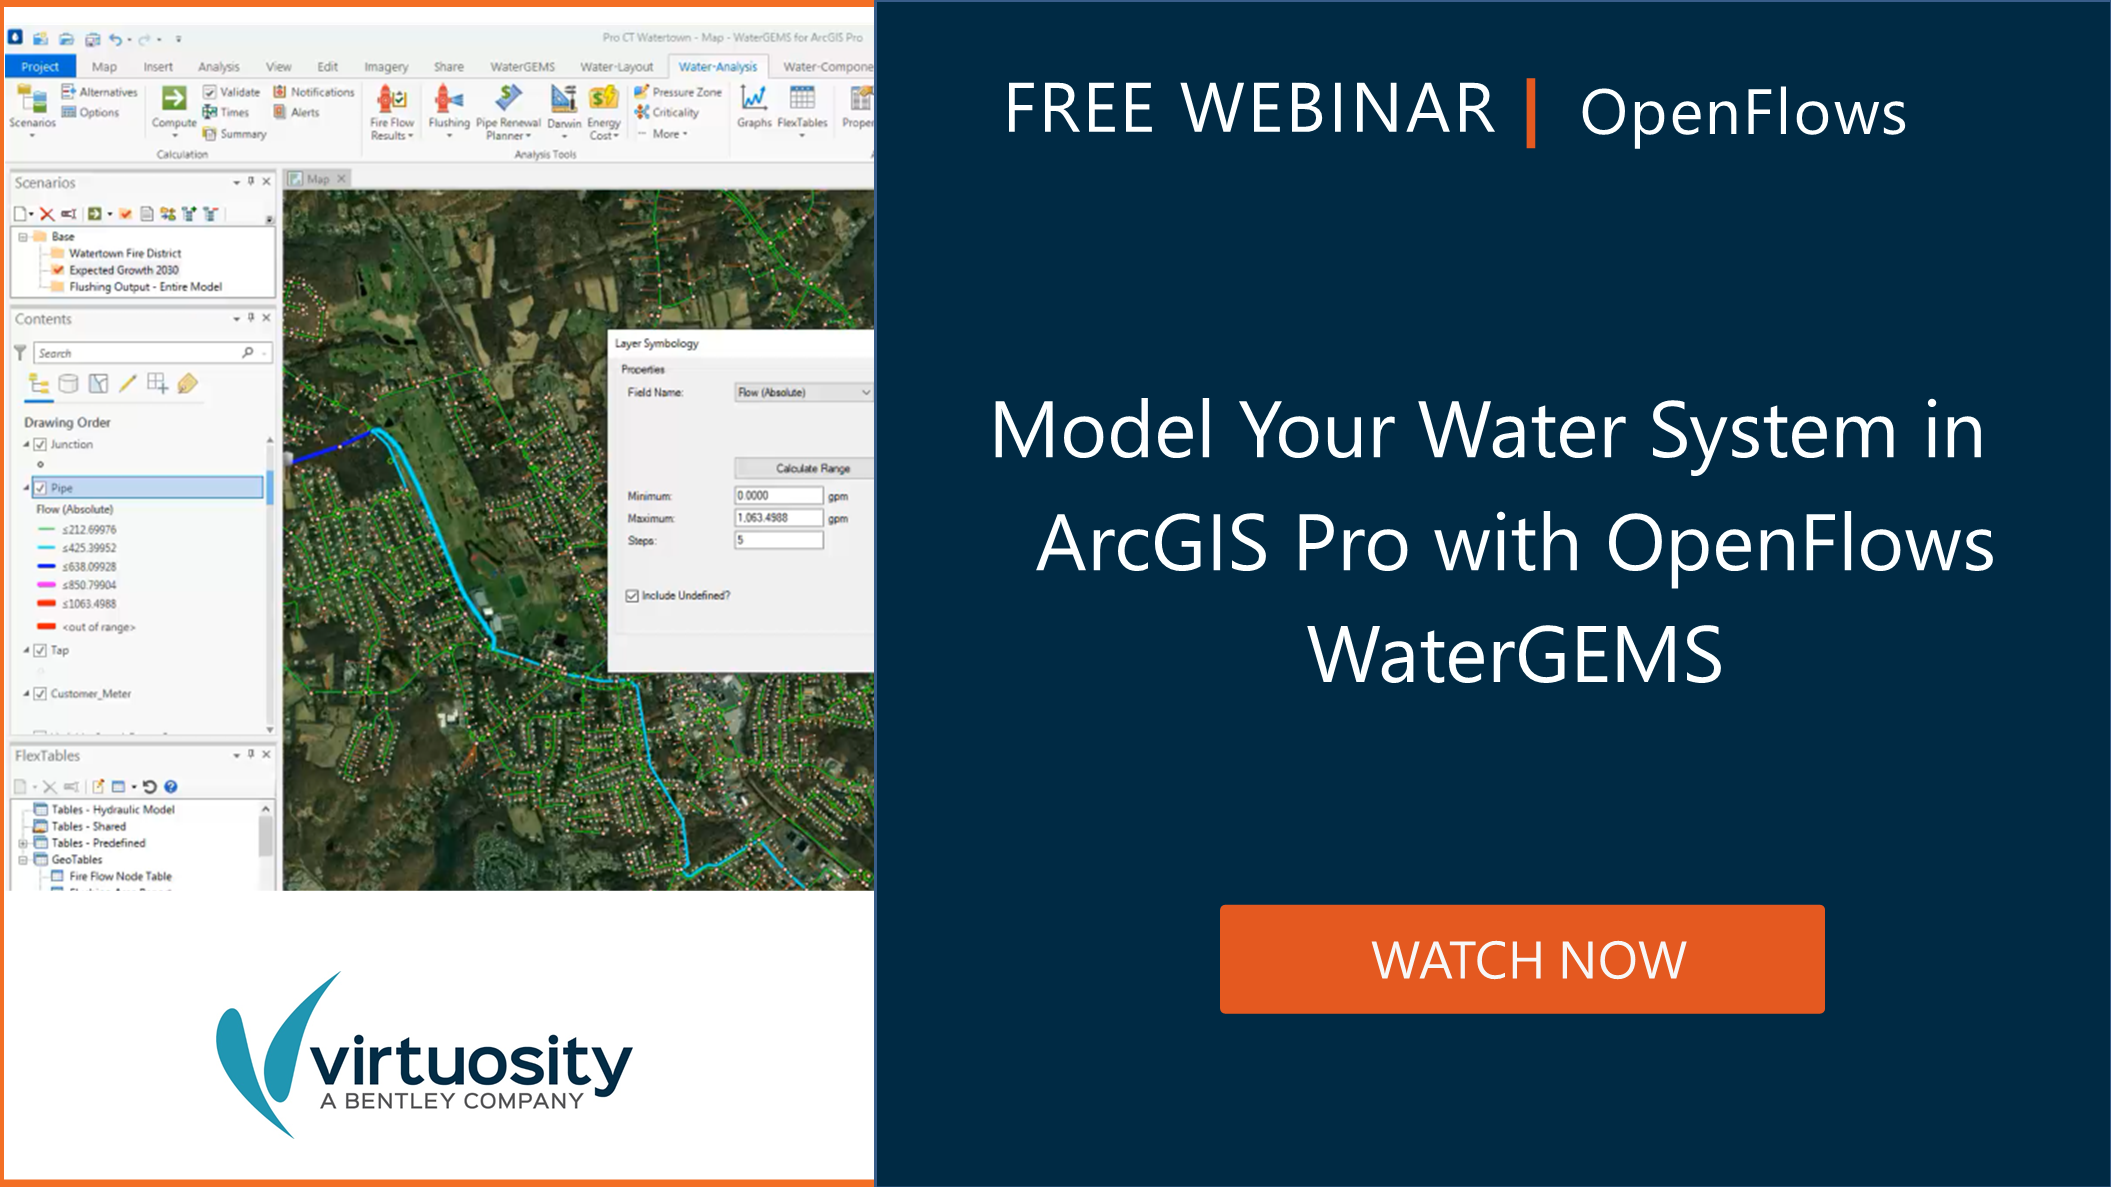 WaterGEMS and ArcGIS Pro Webinar